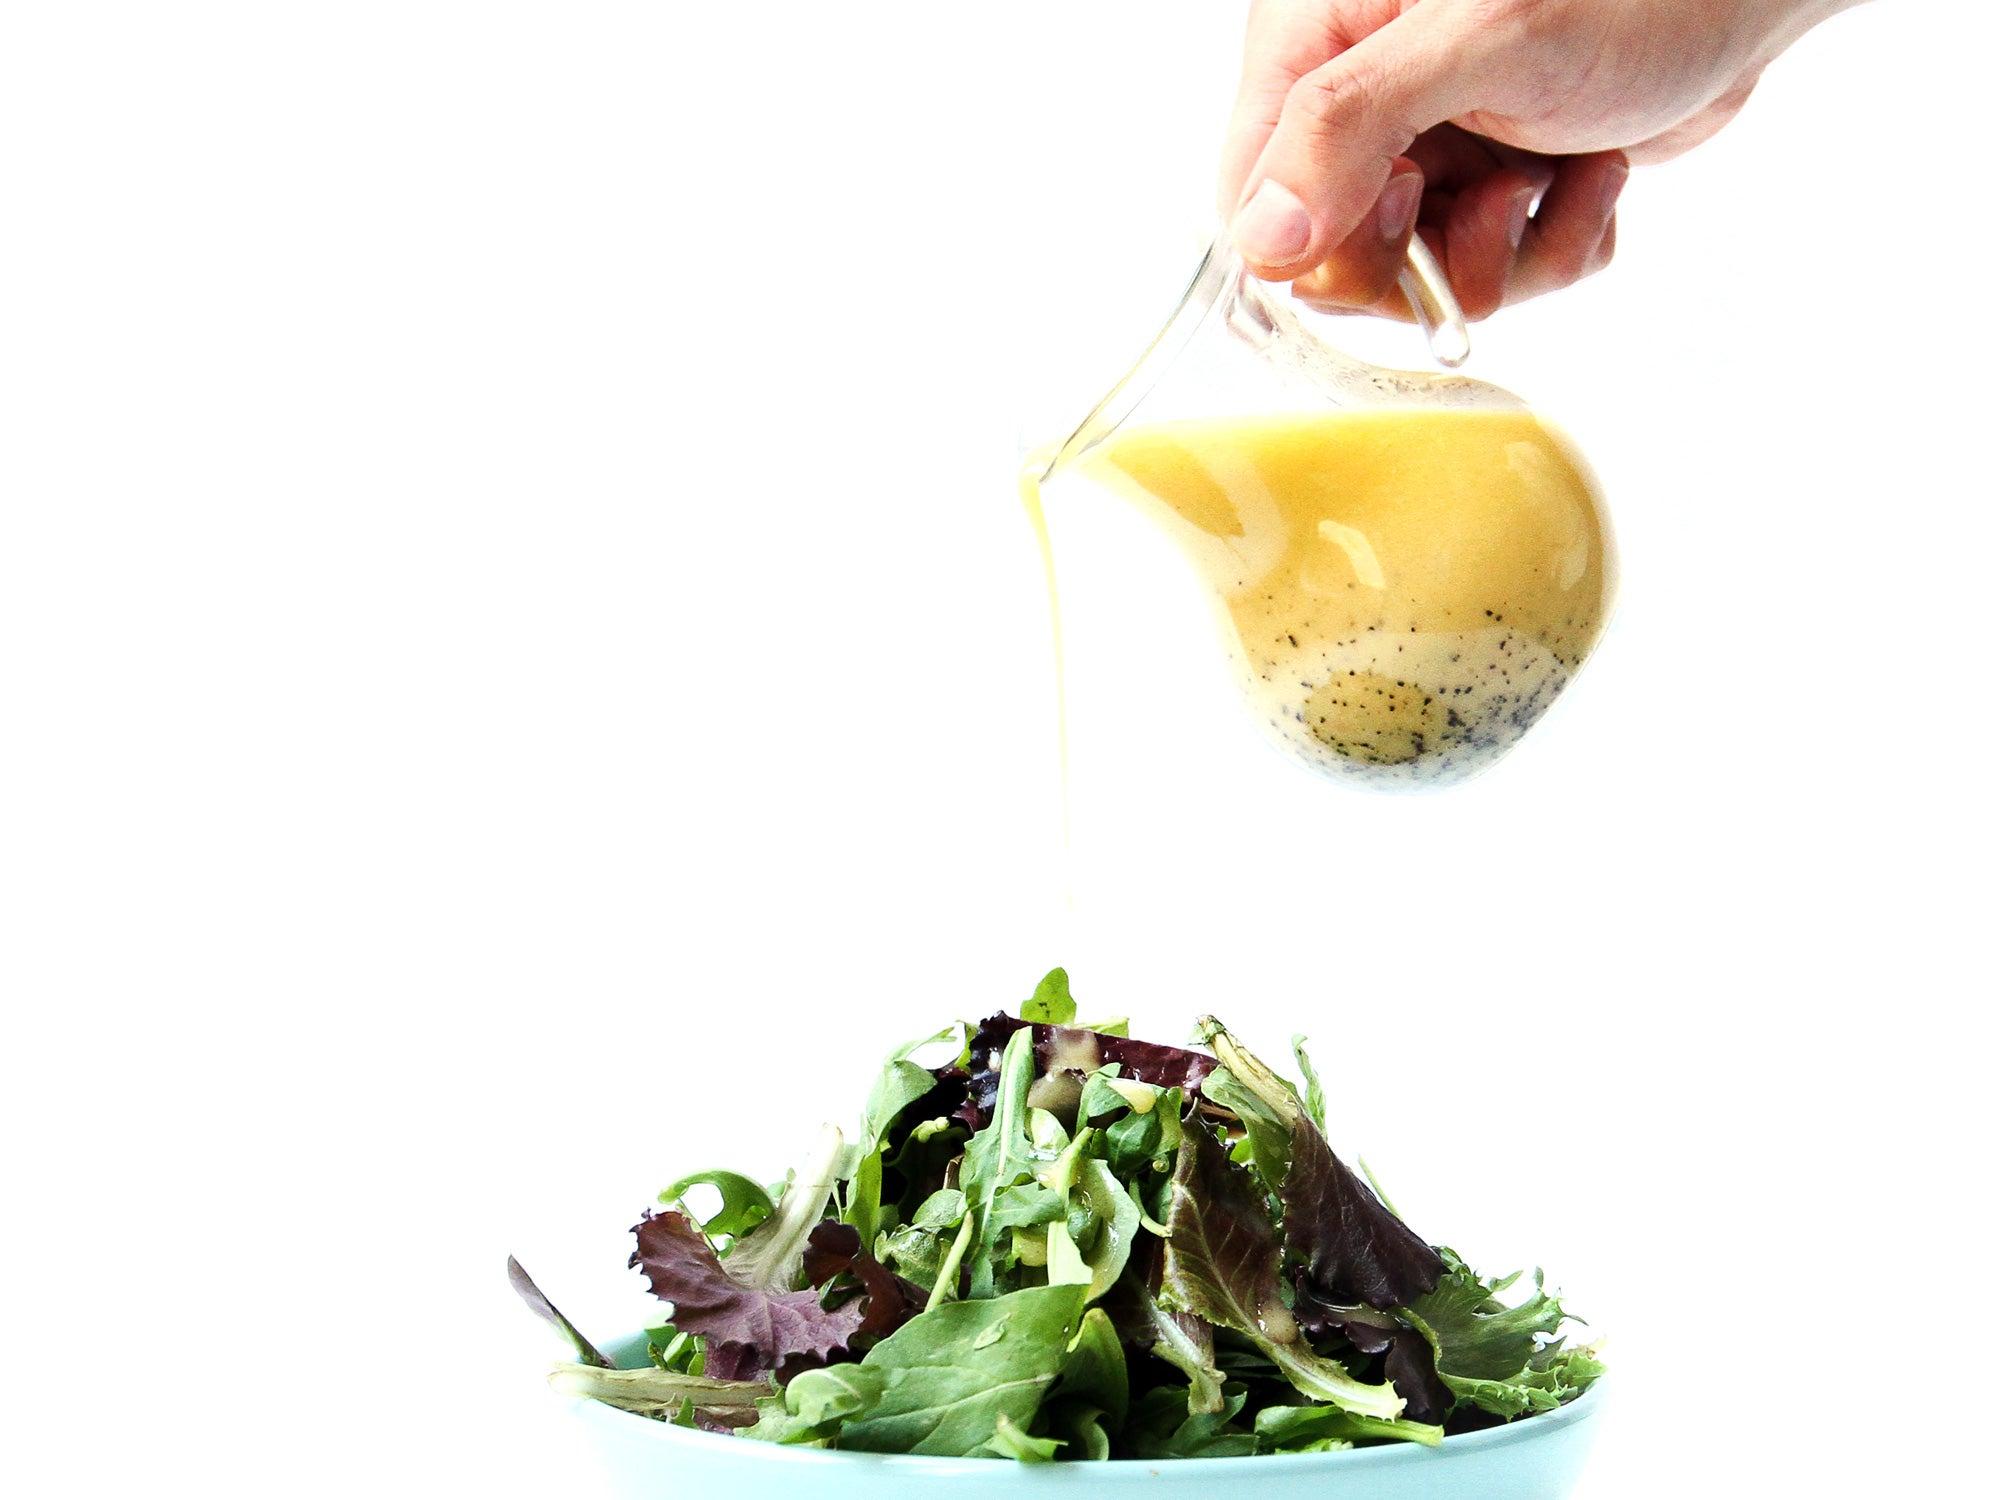 Put Papaya Seeds in Your Salad Dressing